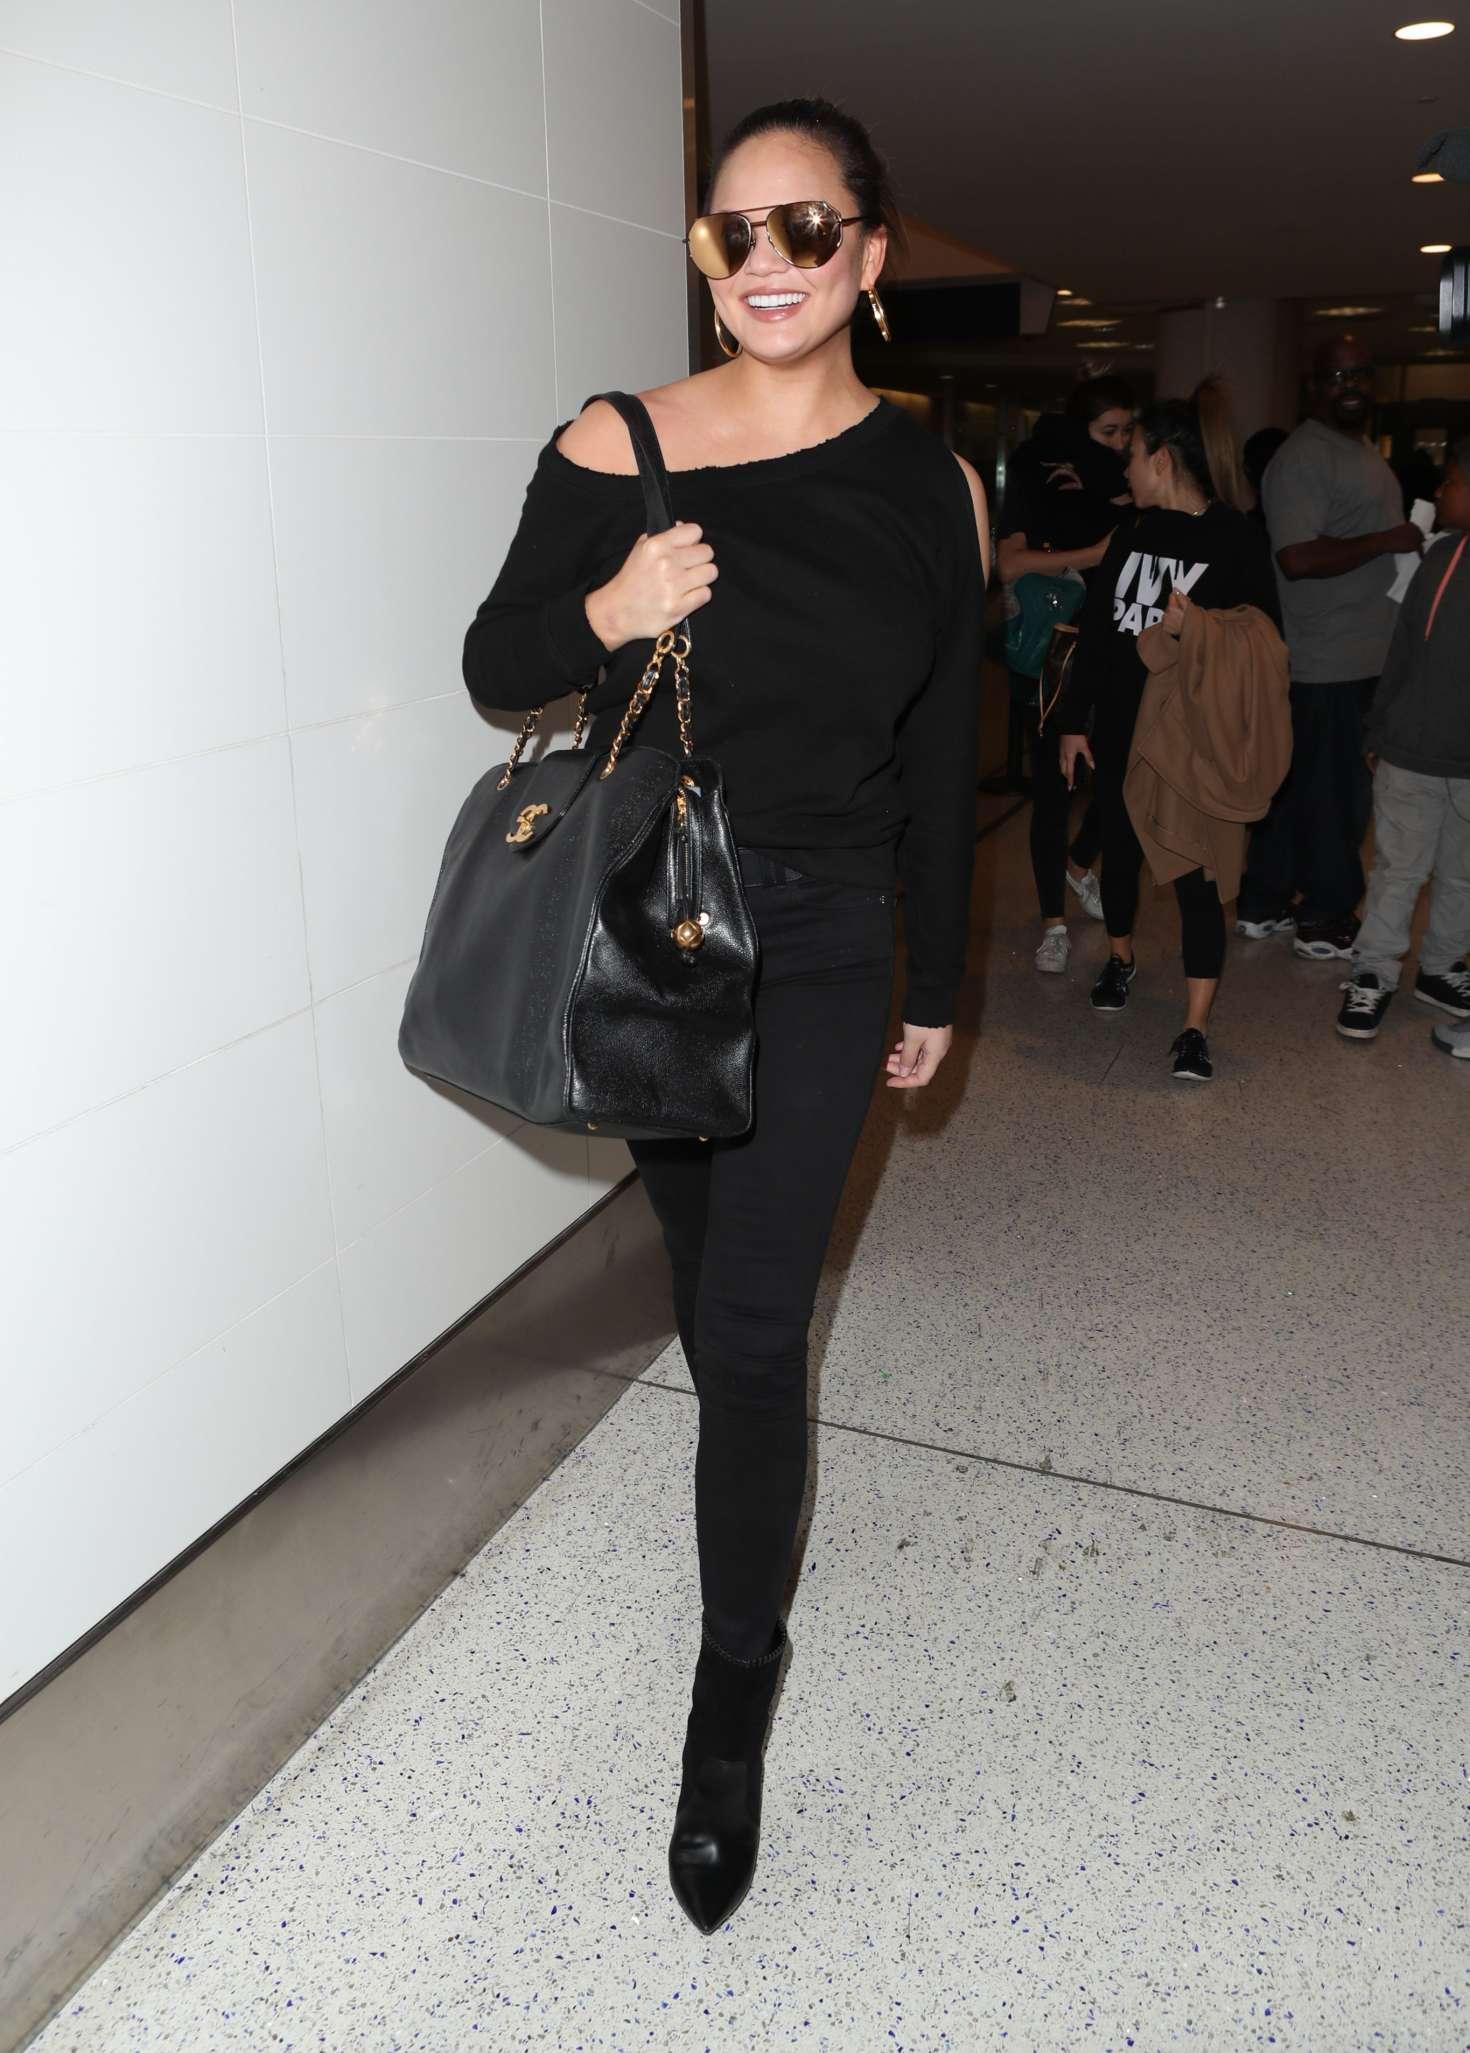 Chrissy Teigen 2015 : Chrissy Teigen: Arrives at LAX Airport -05